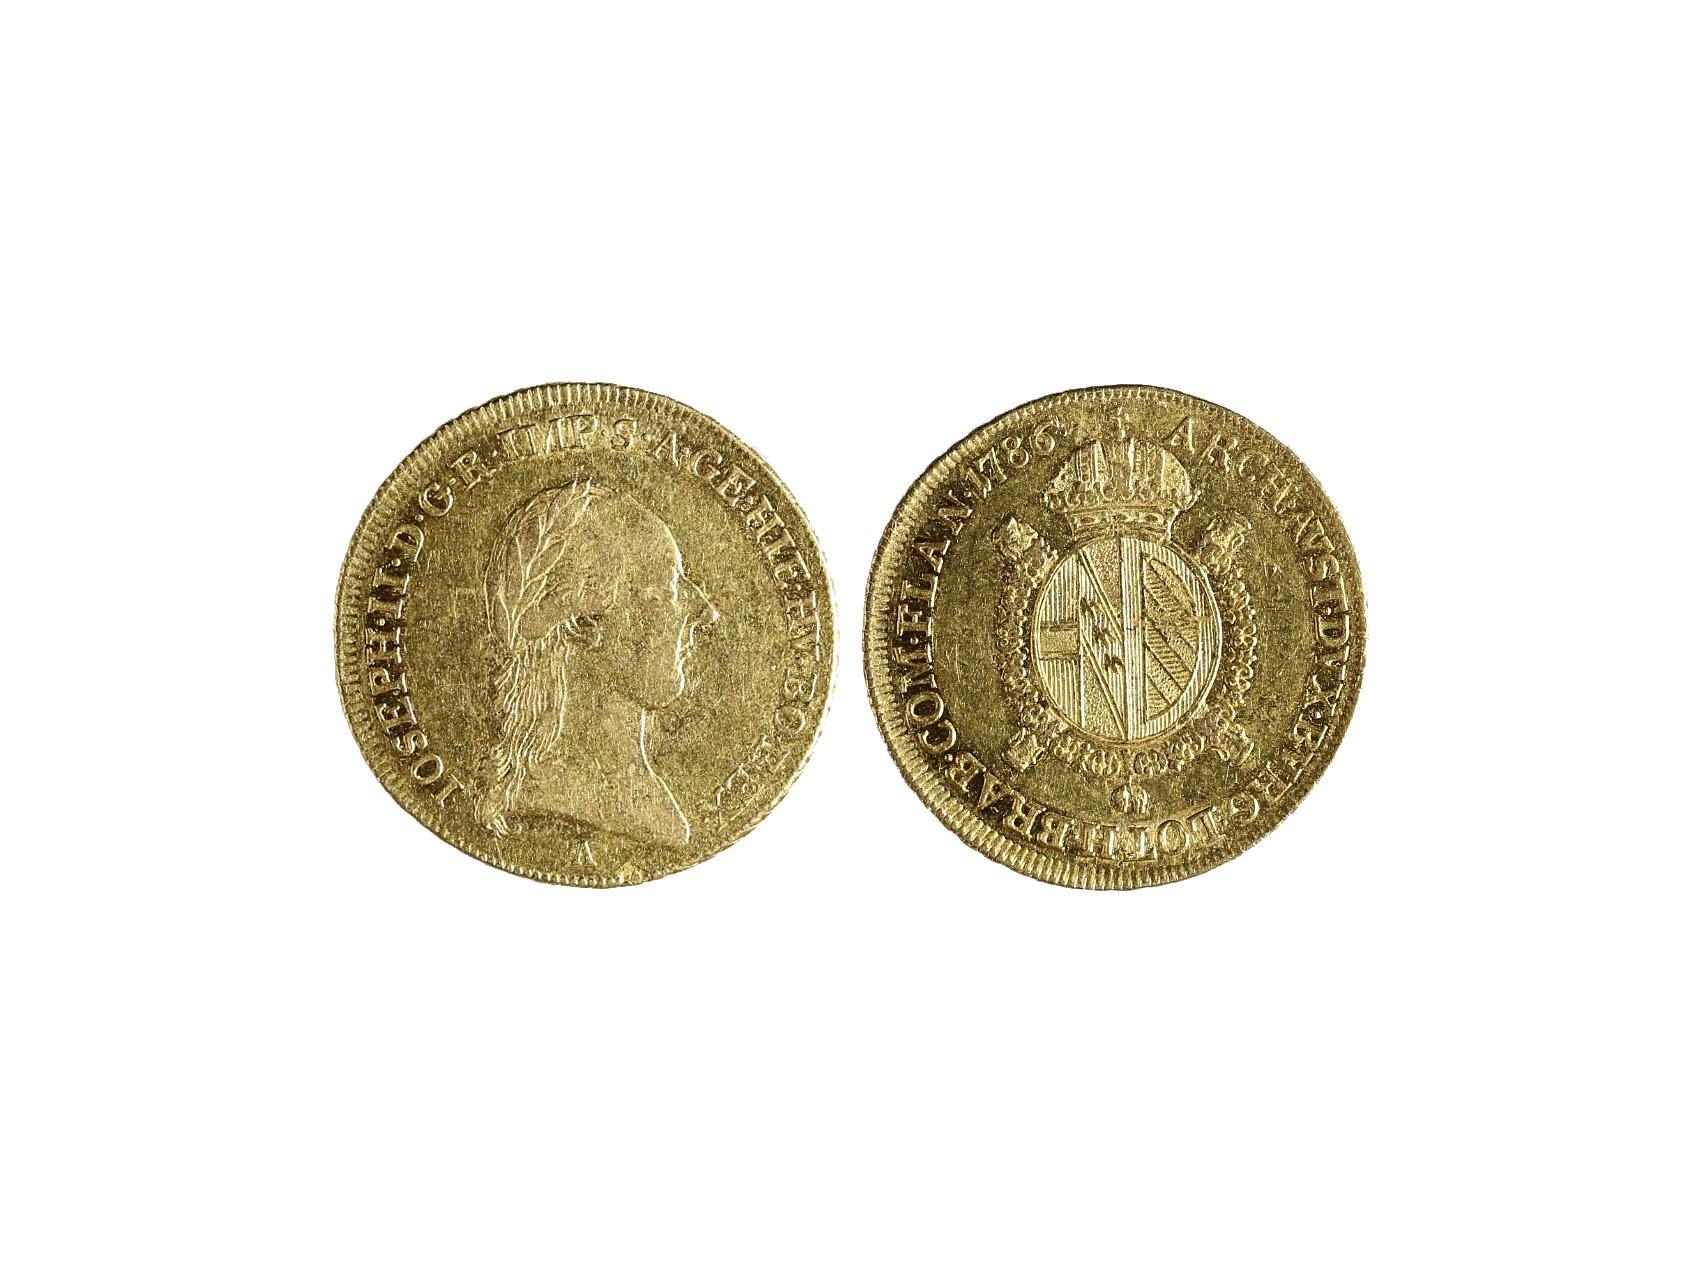 Josef II. 1765-1790 - 1/2 Sovráno 1786 A, N60